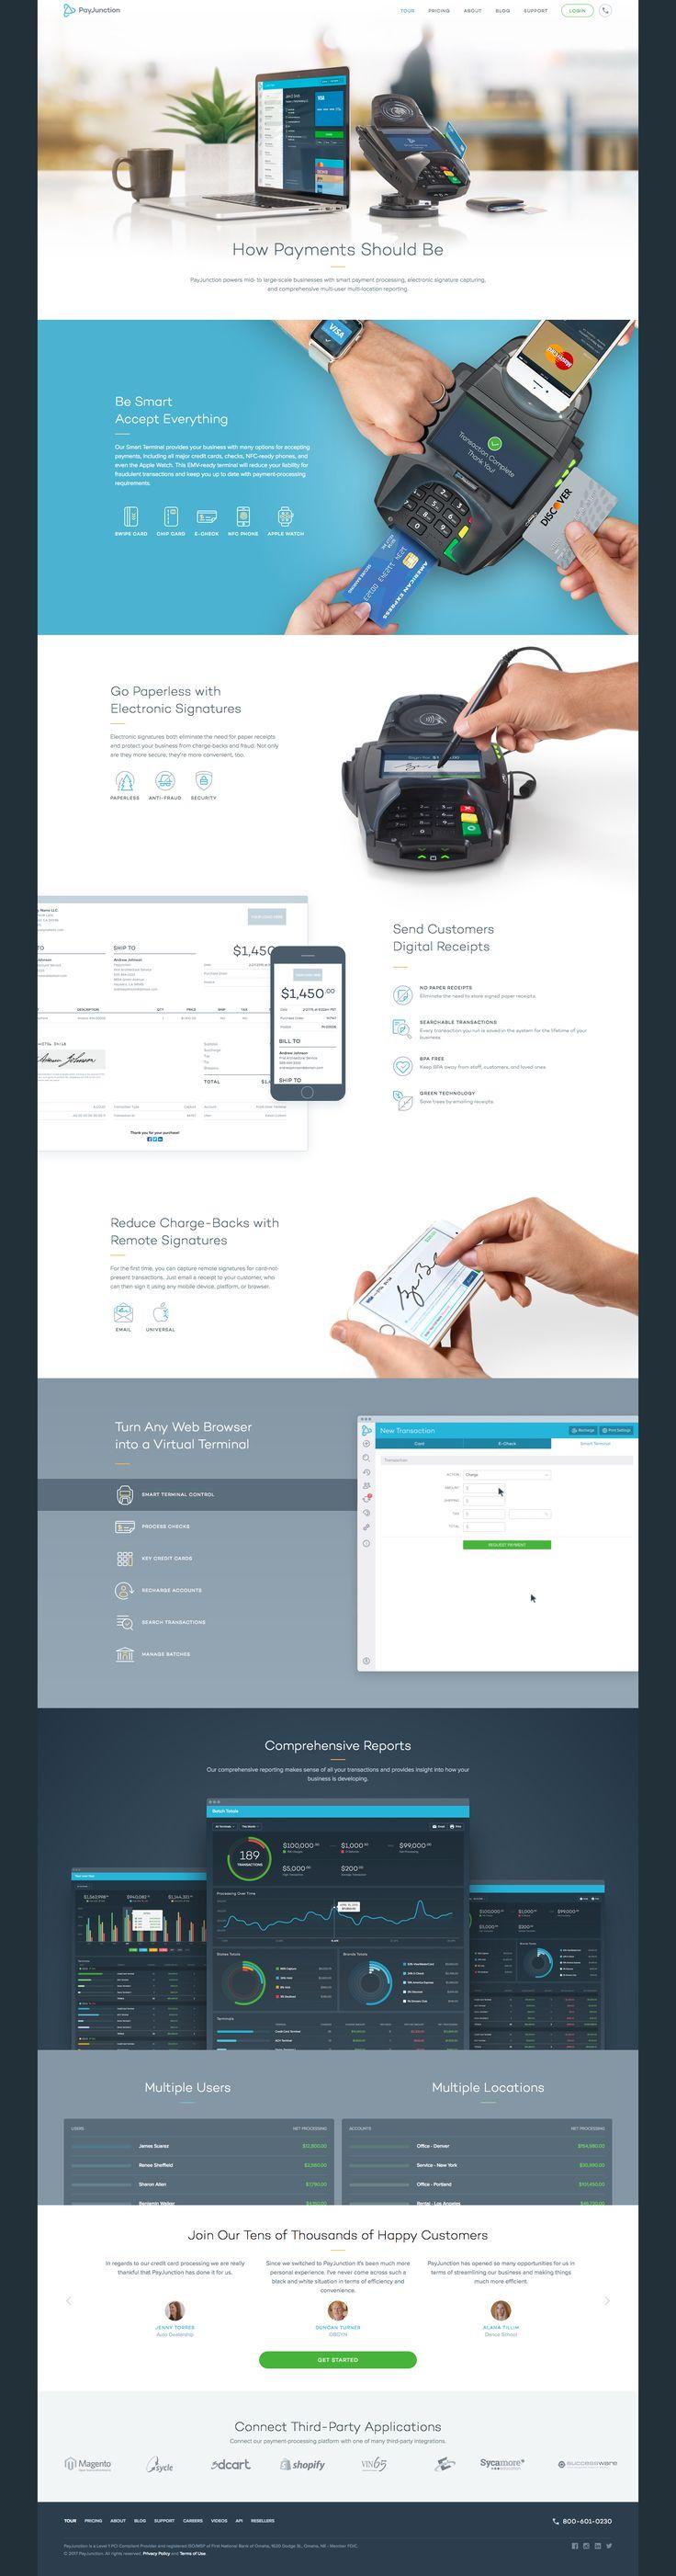 PayJunction Website Design